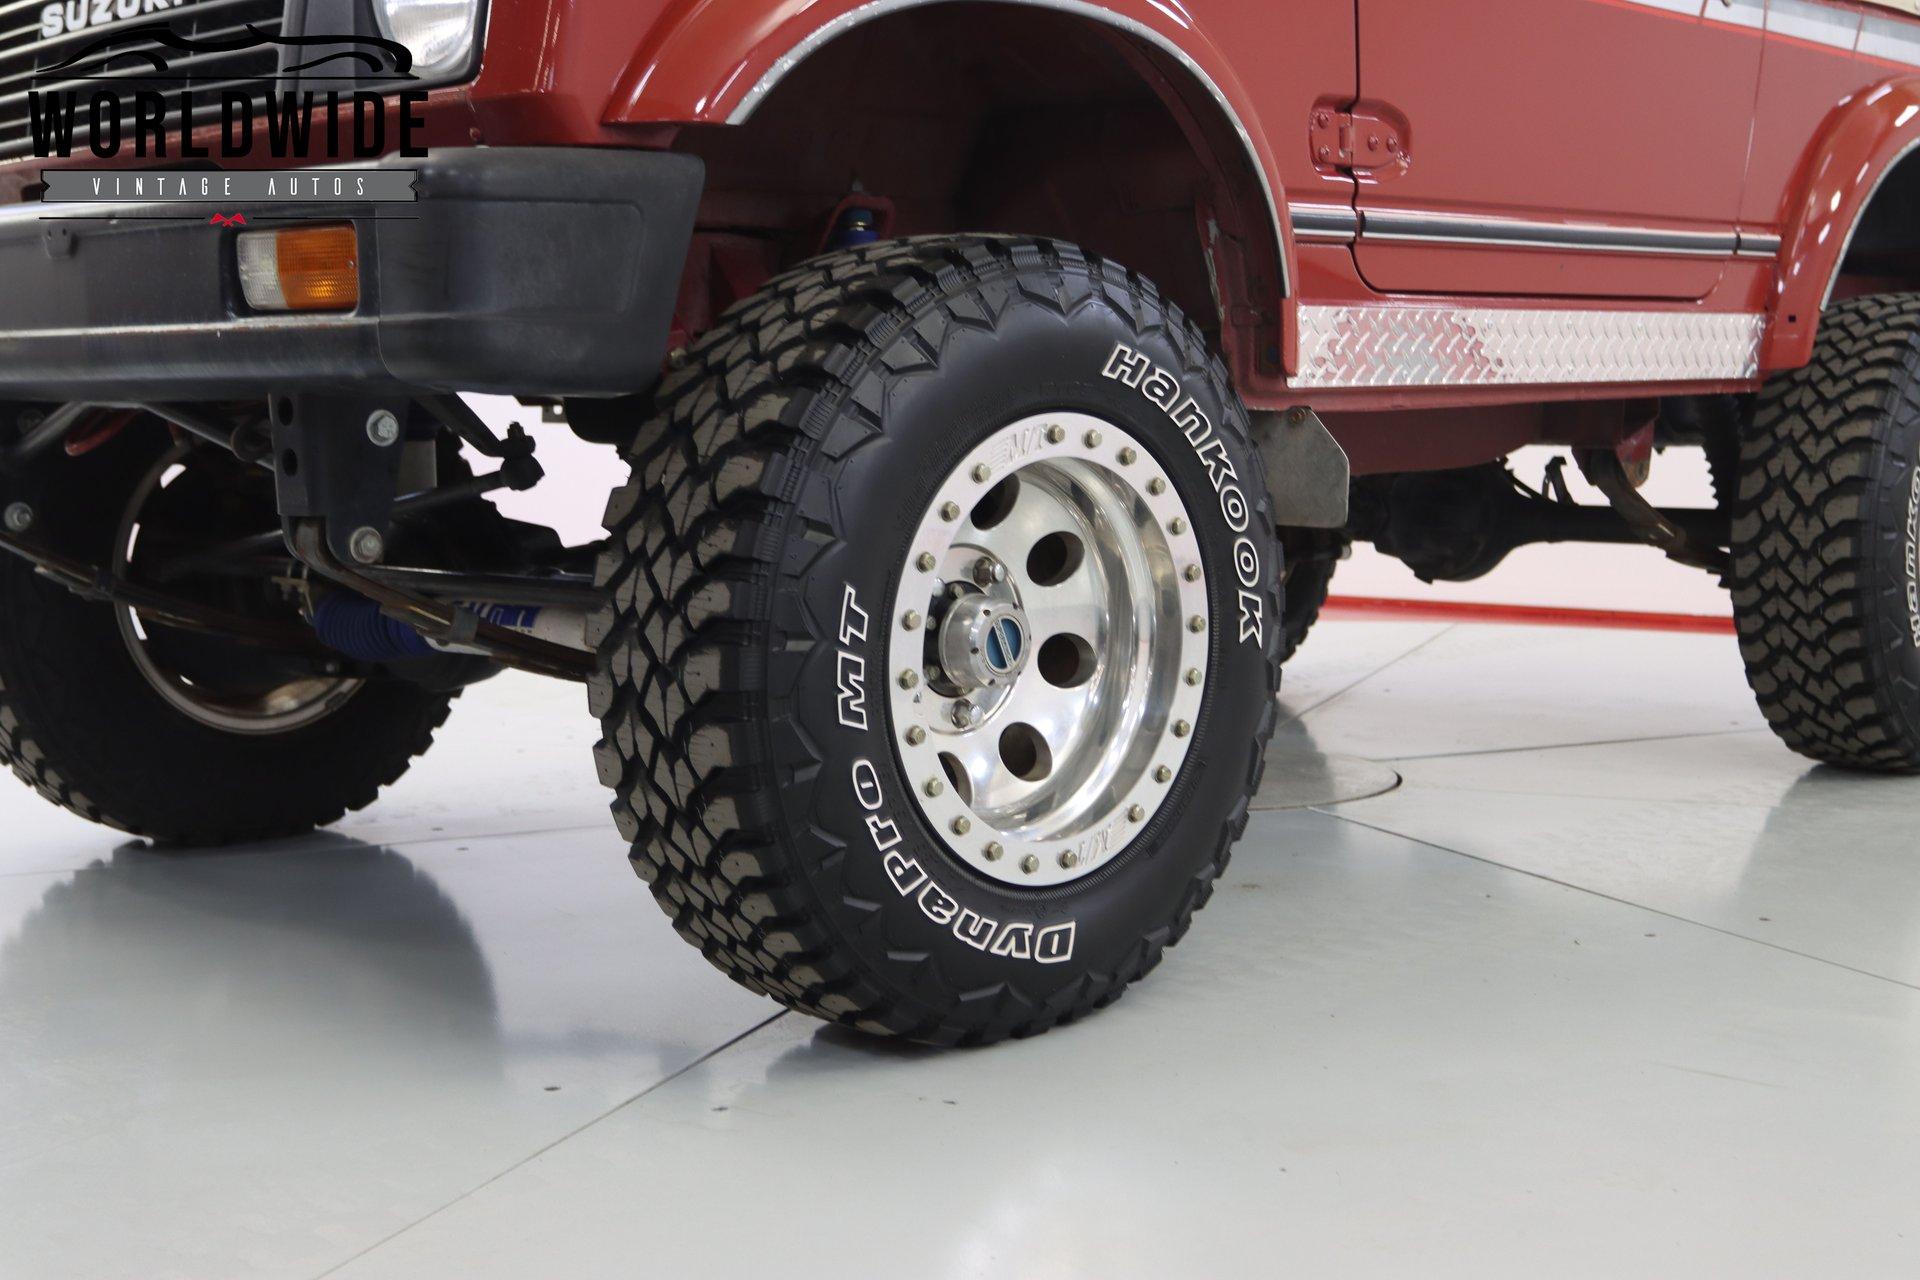 1987 Suzuki Samurai